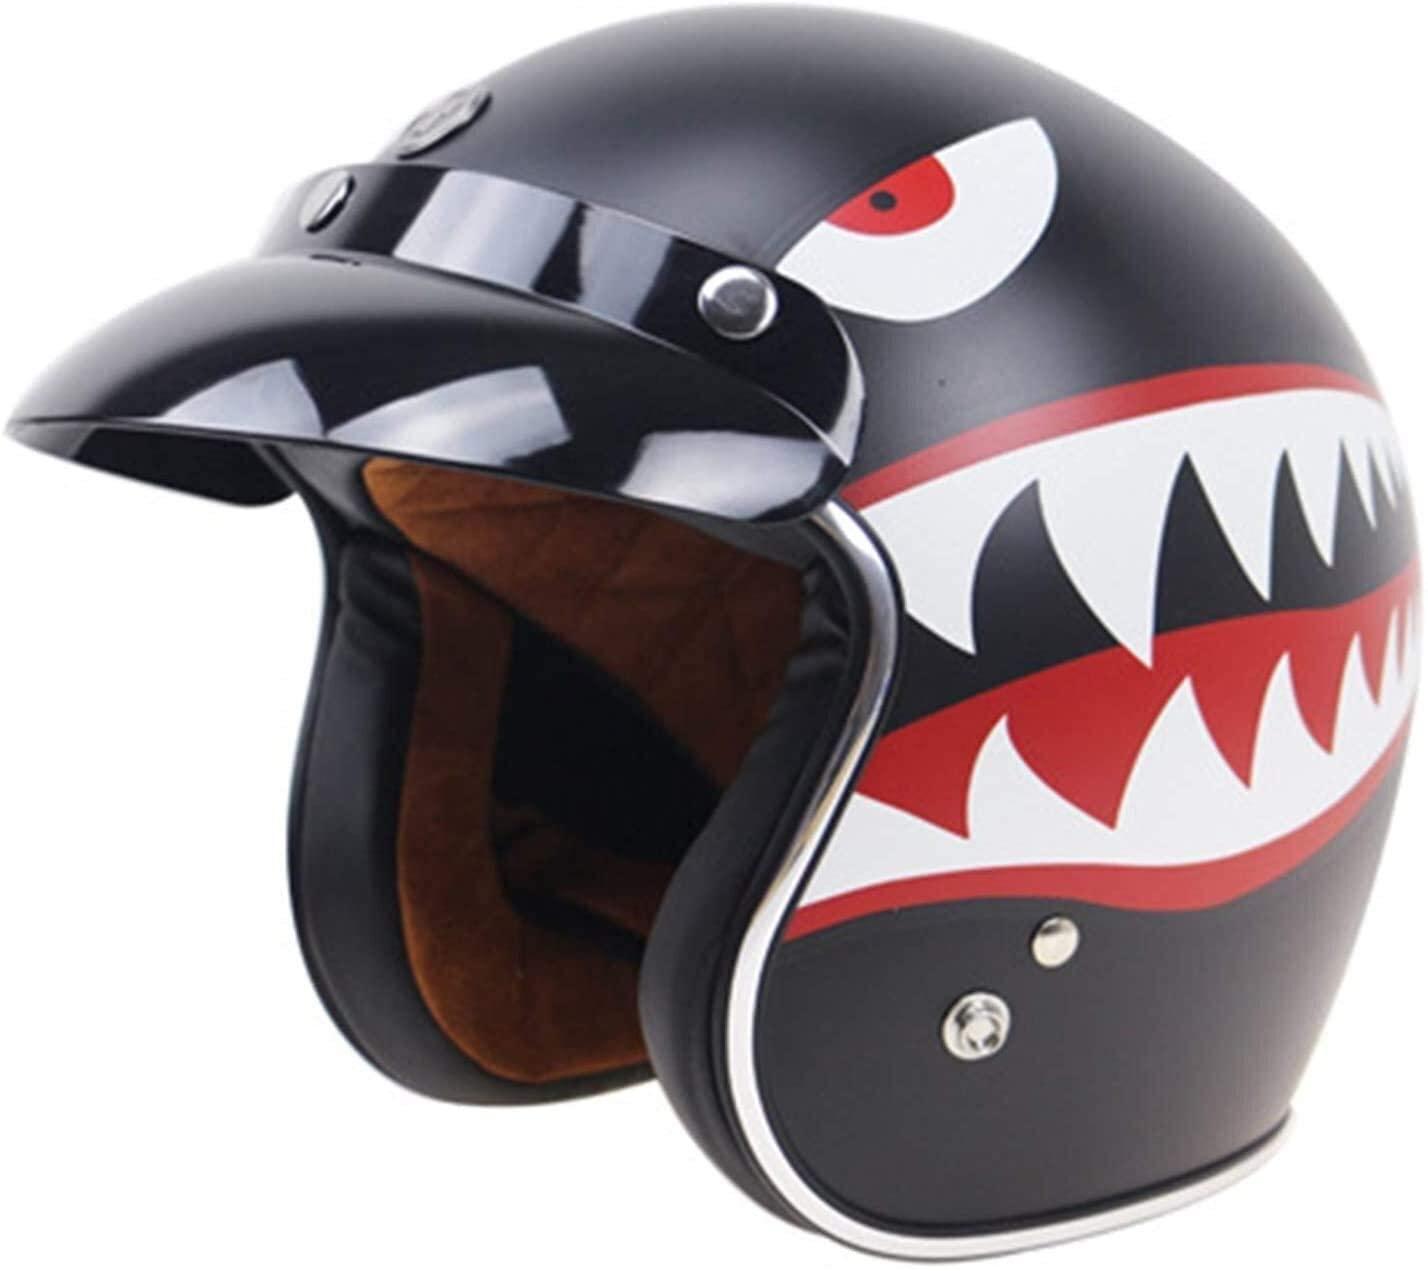 DFVV Helmet Motorcycle Helmet Adult Male Female Retro Summer Open face Half Helmet DOT Approved, Motorcycle Helmet (Size : Large)